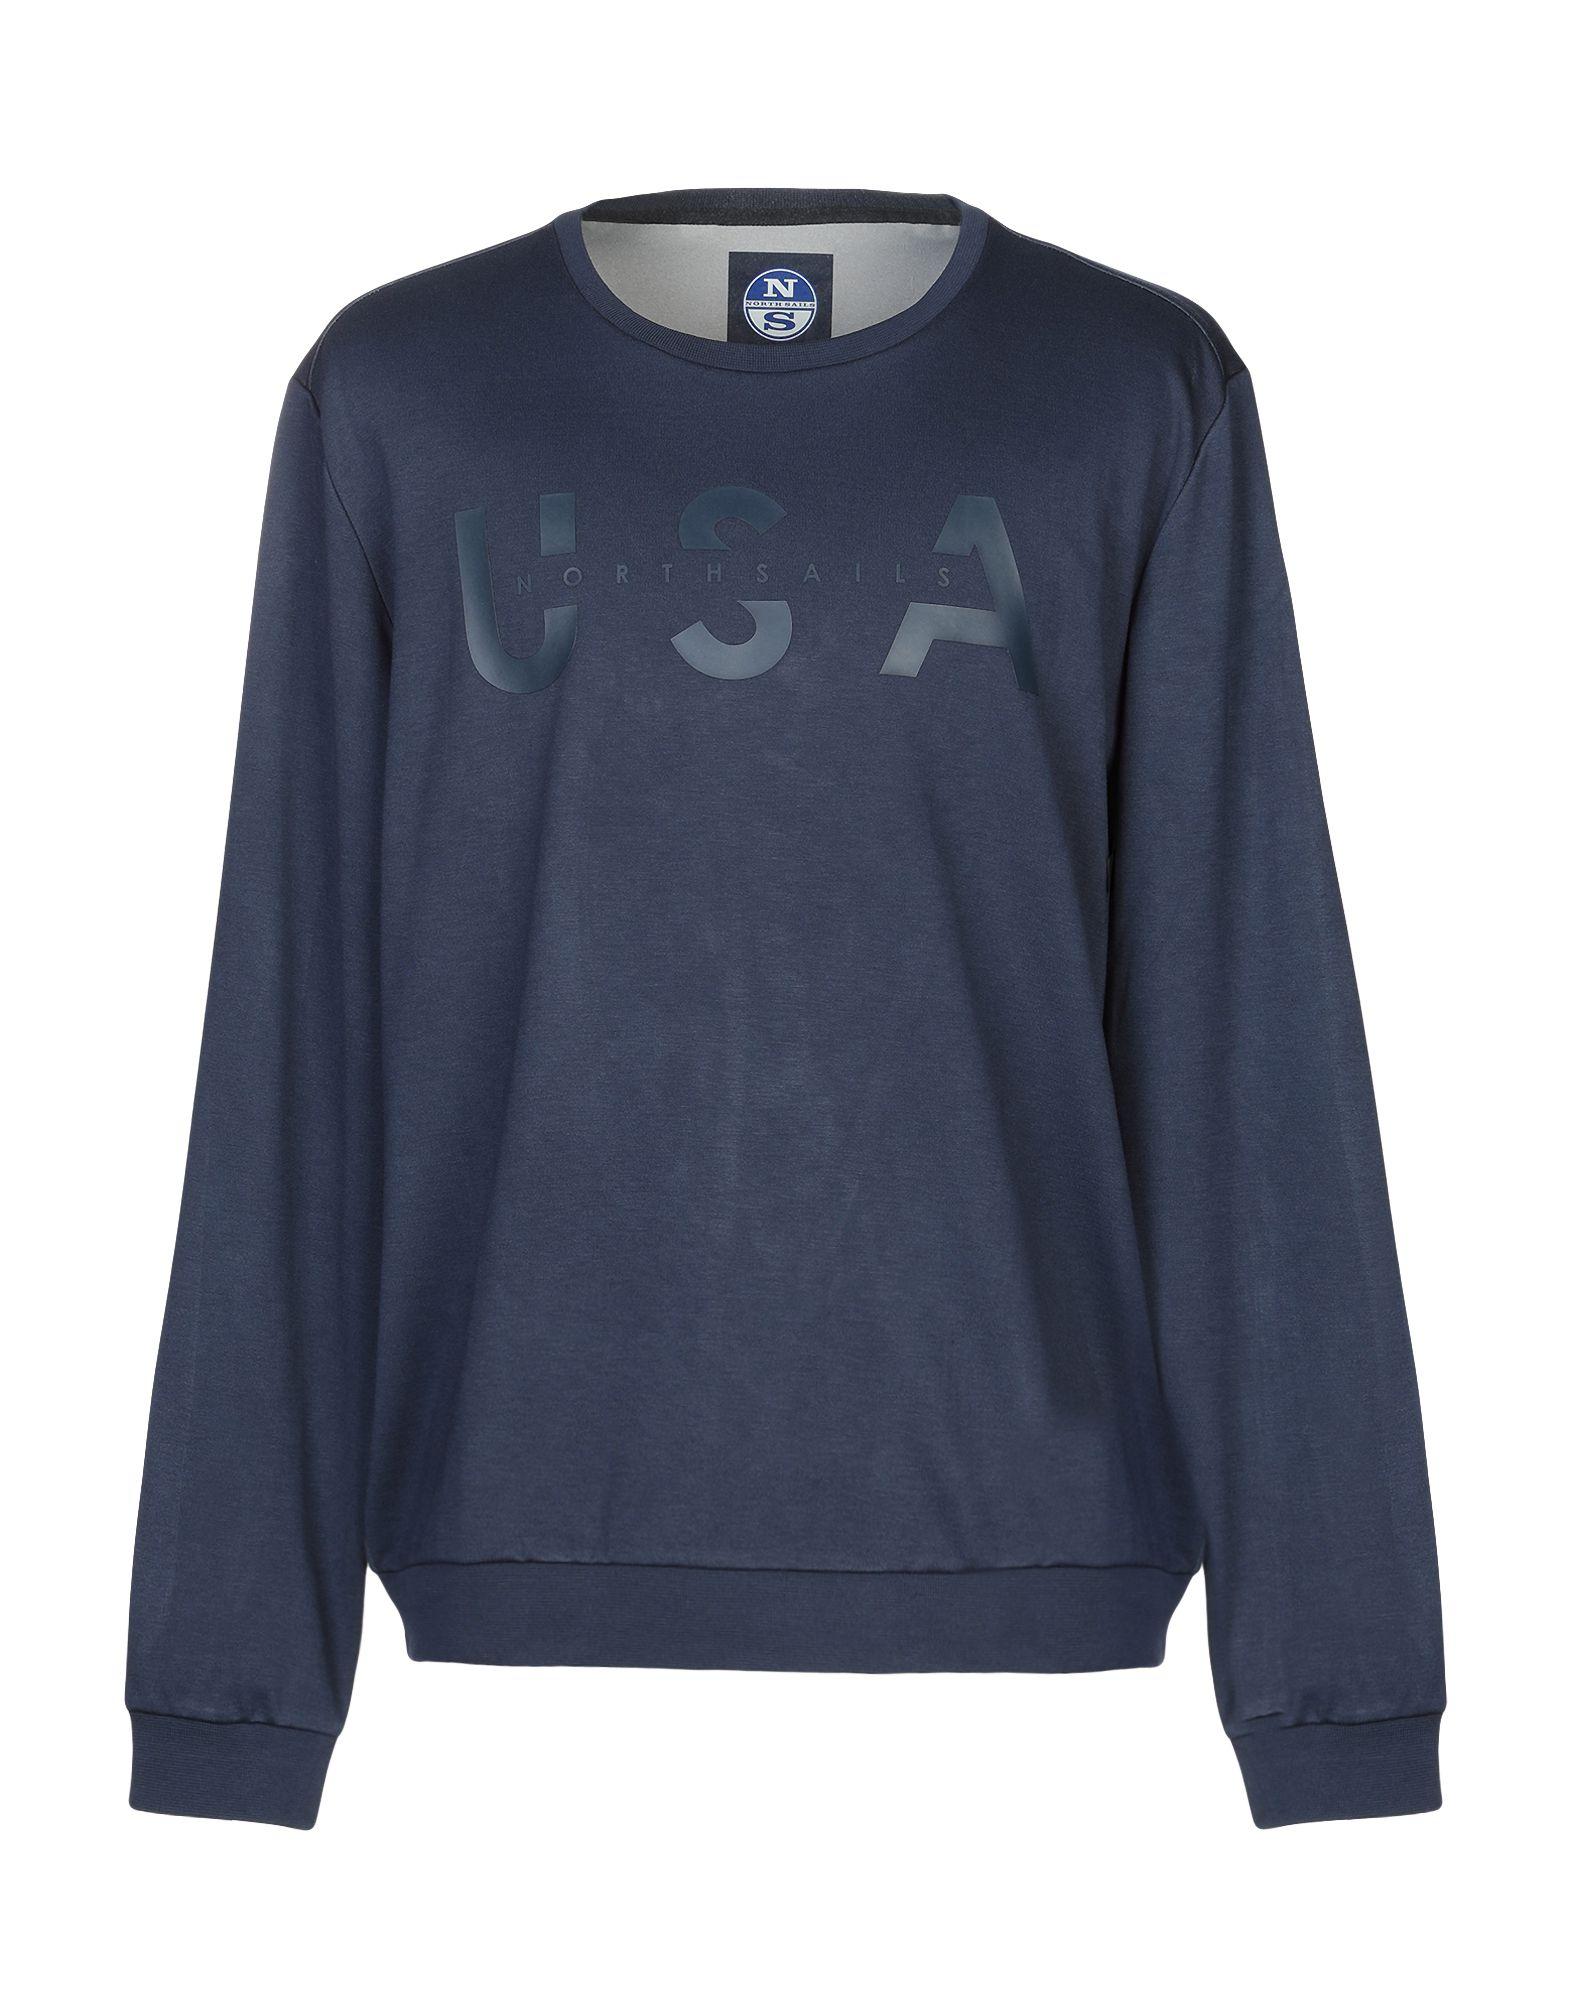 NORTH SAILS Herren Sweatshirt8 blau